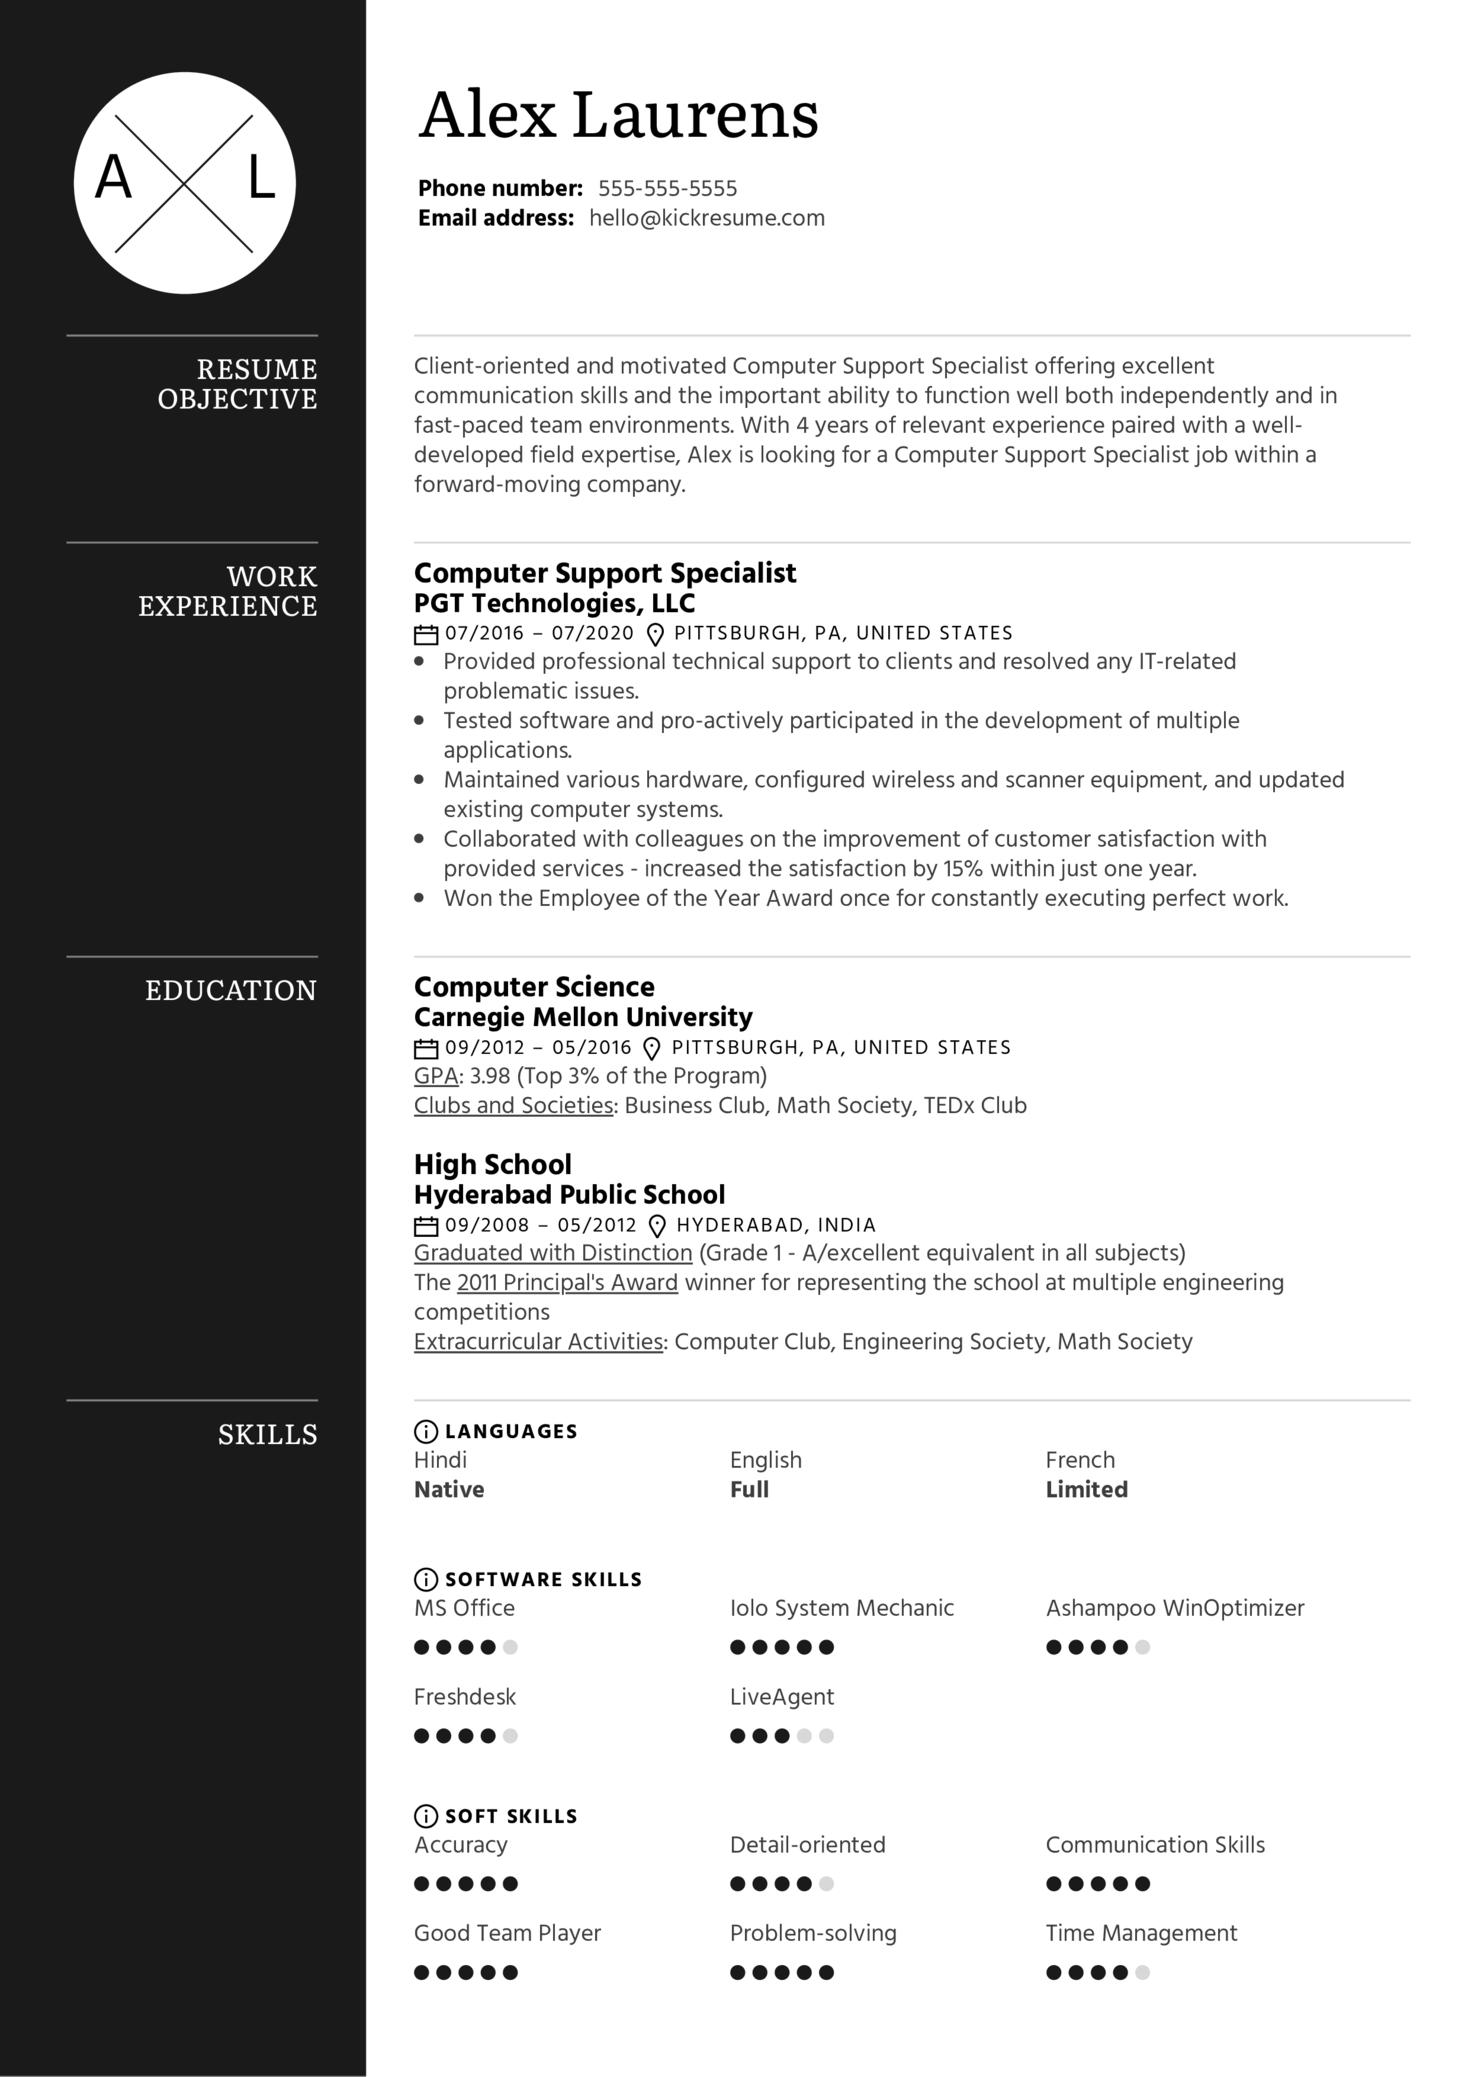 Basic Resume Template (Part 1)